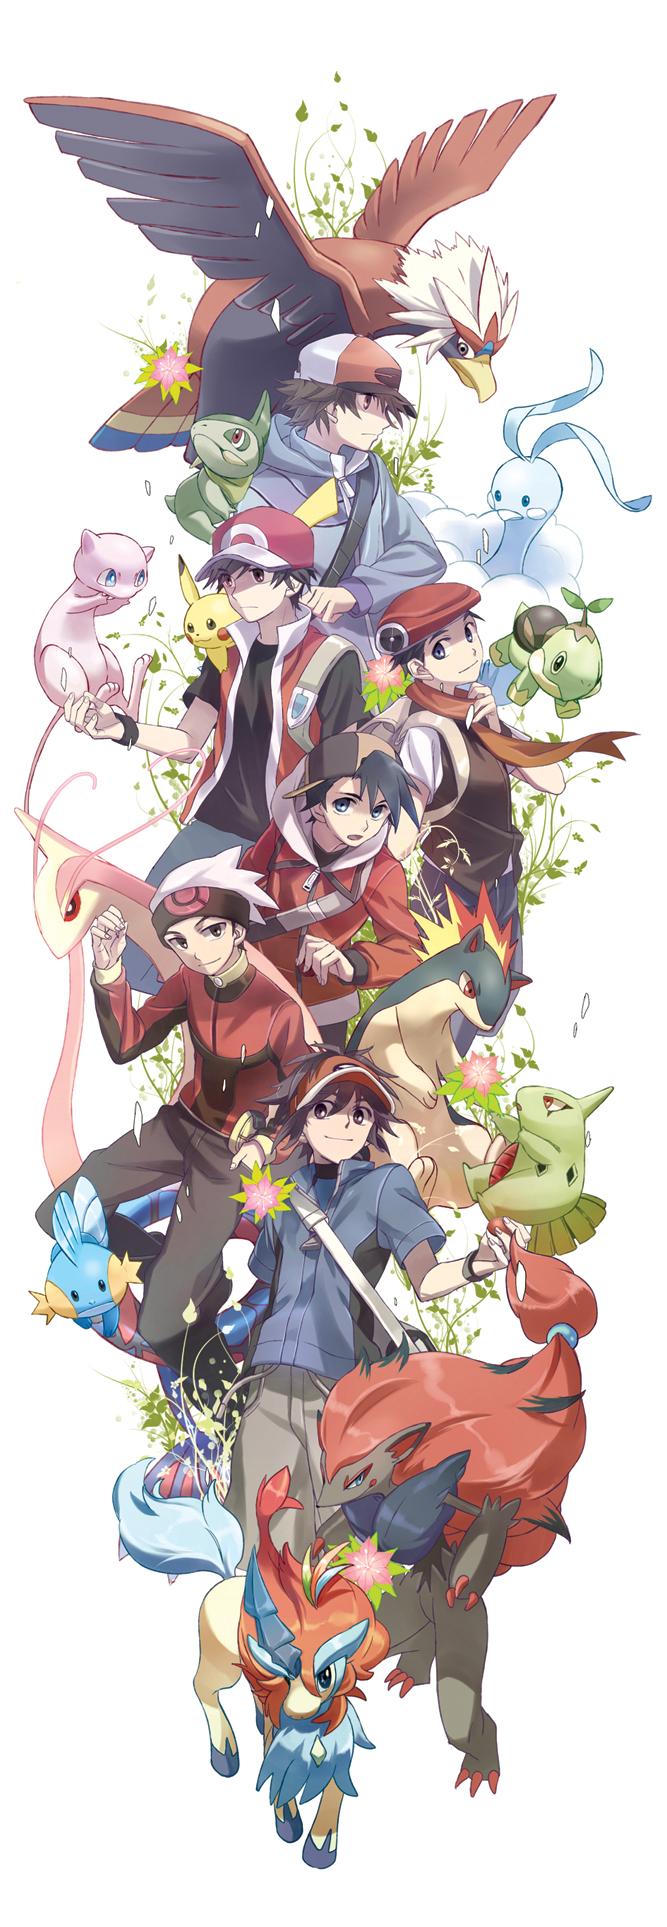 Tags: Anime, Msmoderato, Pokémon, Milotic, Yuuki (Pokémon), Mudkip, Larvitar, Touya (Pokémon), Kouki (Pokémon), Mew, Altaria, Red (Pokémon), Kyouhei